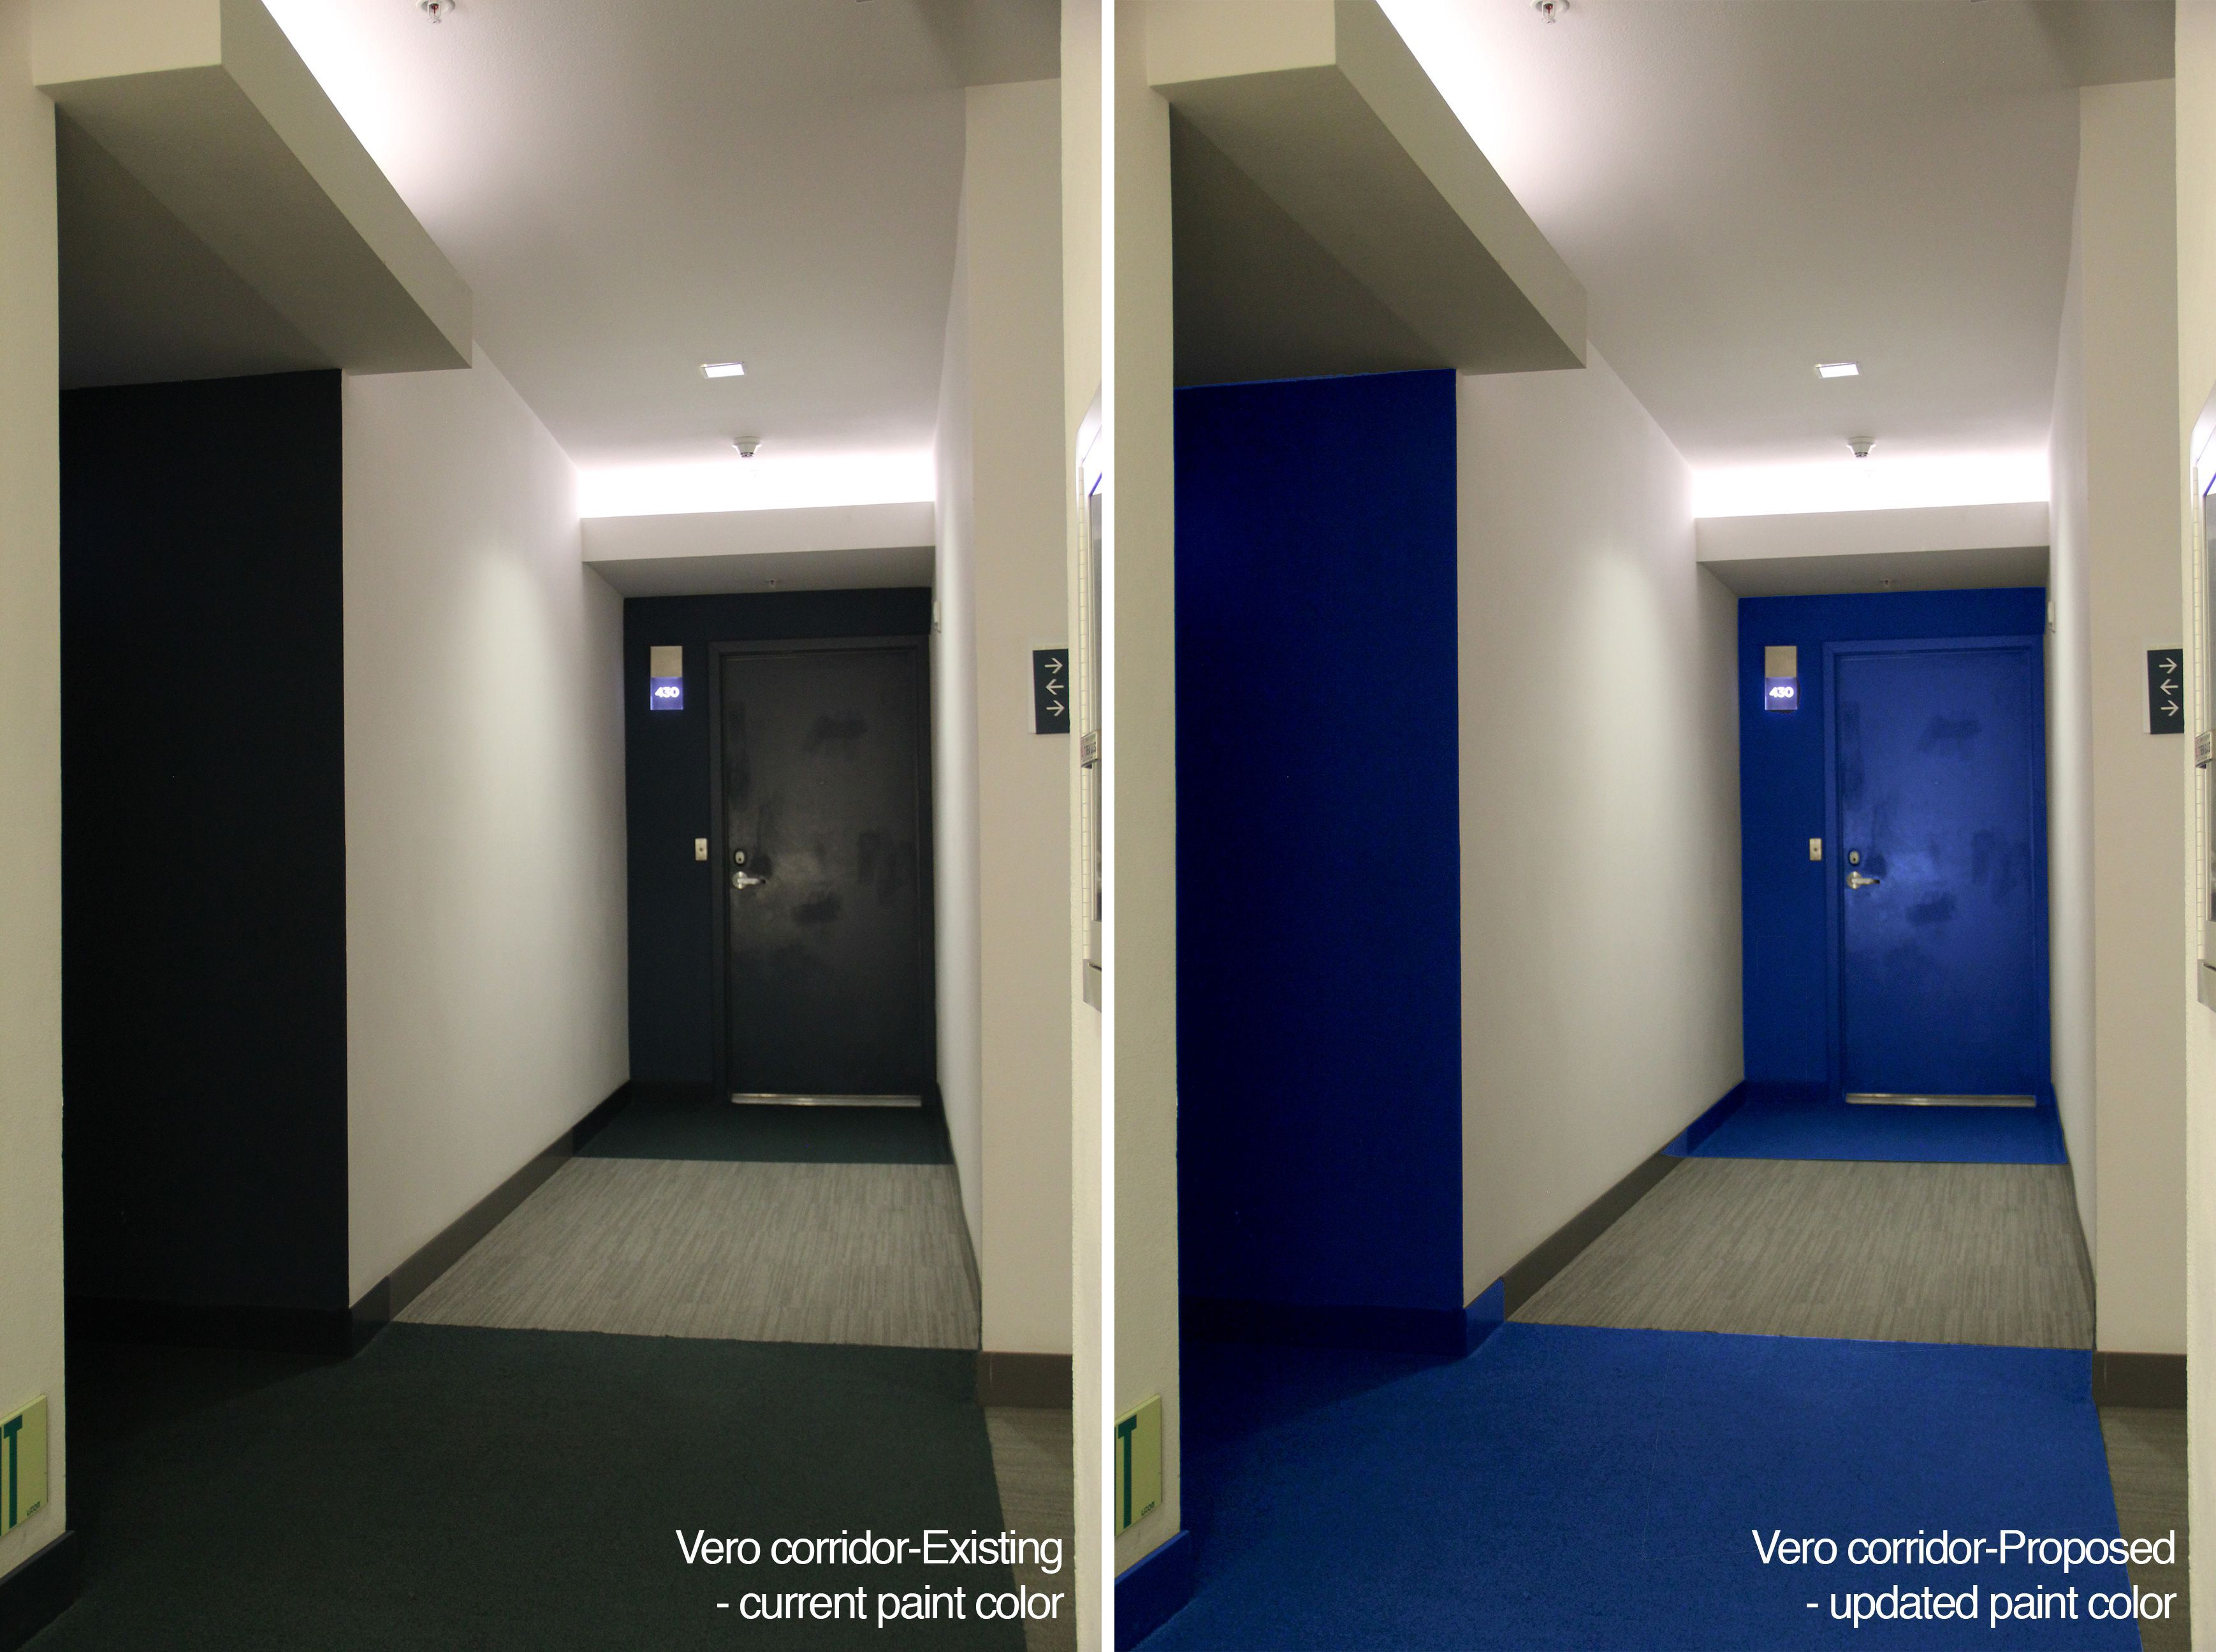 Proposal To Keep Existing Corridor Color Zones Scheme But Update Improve The Proposal To Keep Existing Corridor In 2020 Lighted Bathroom Mirror Design Corridor